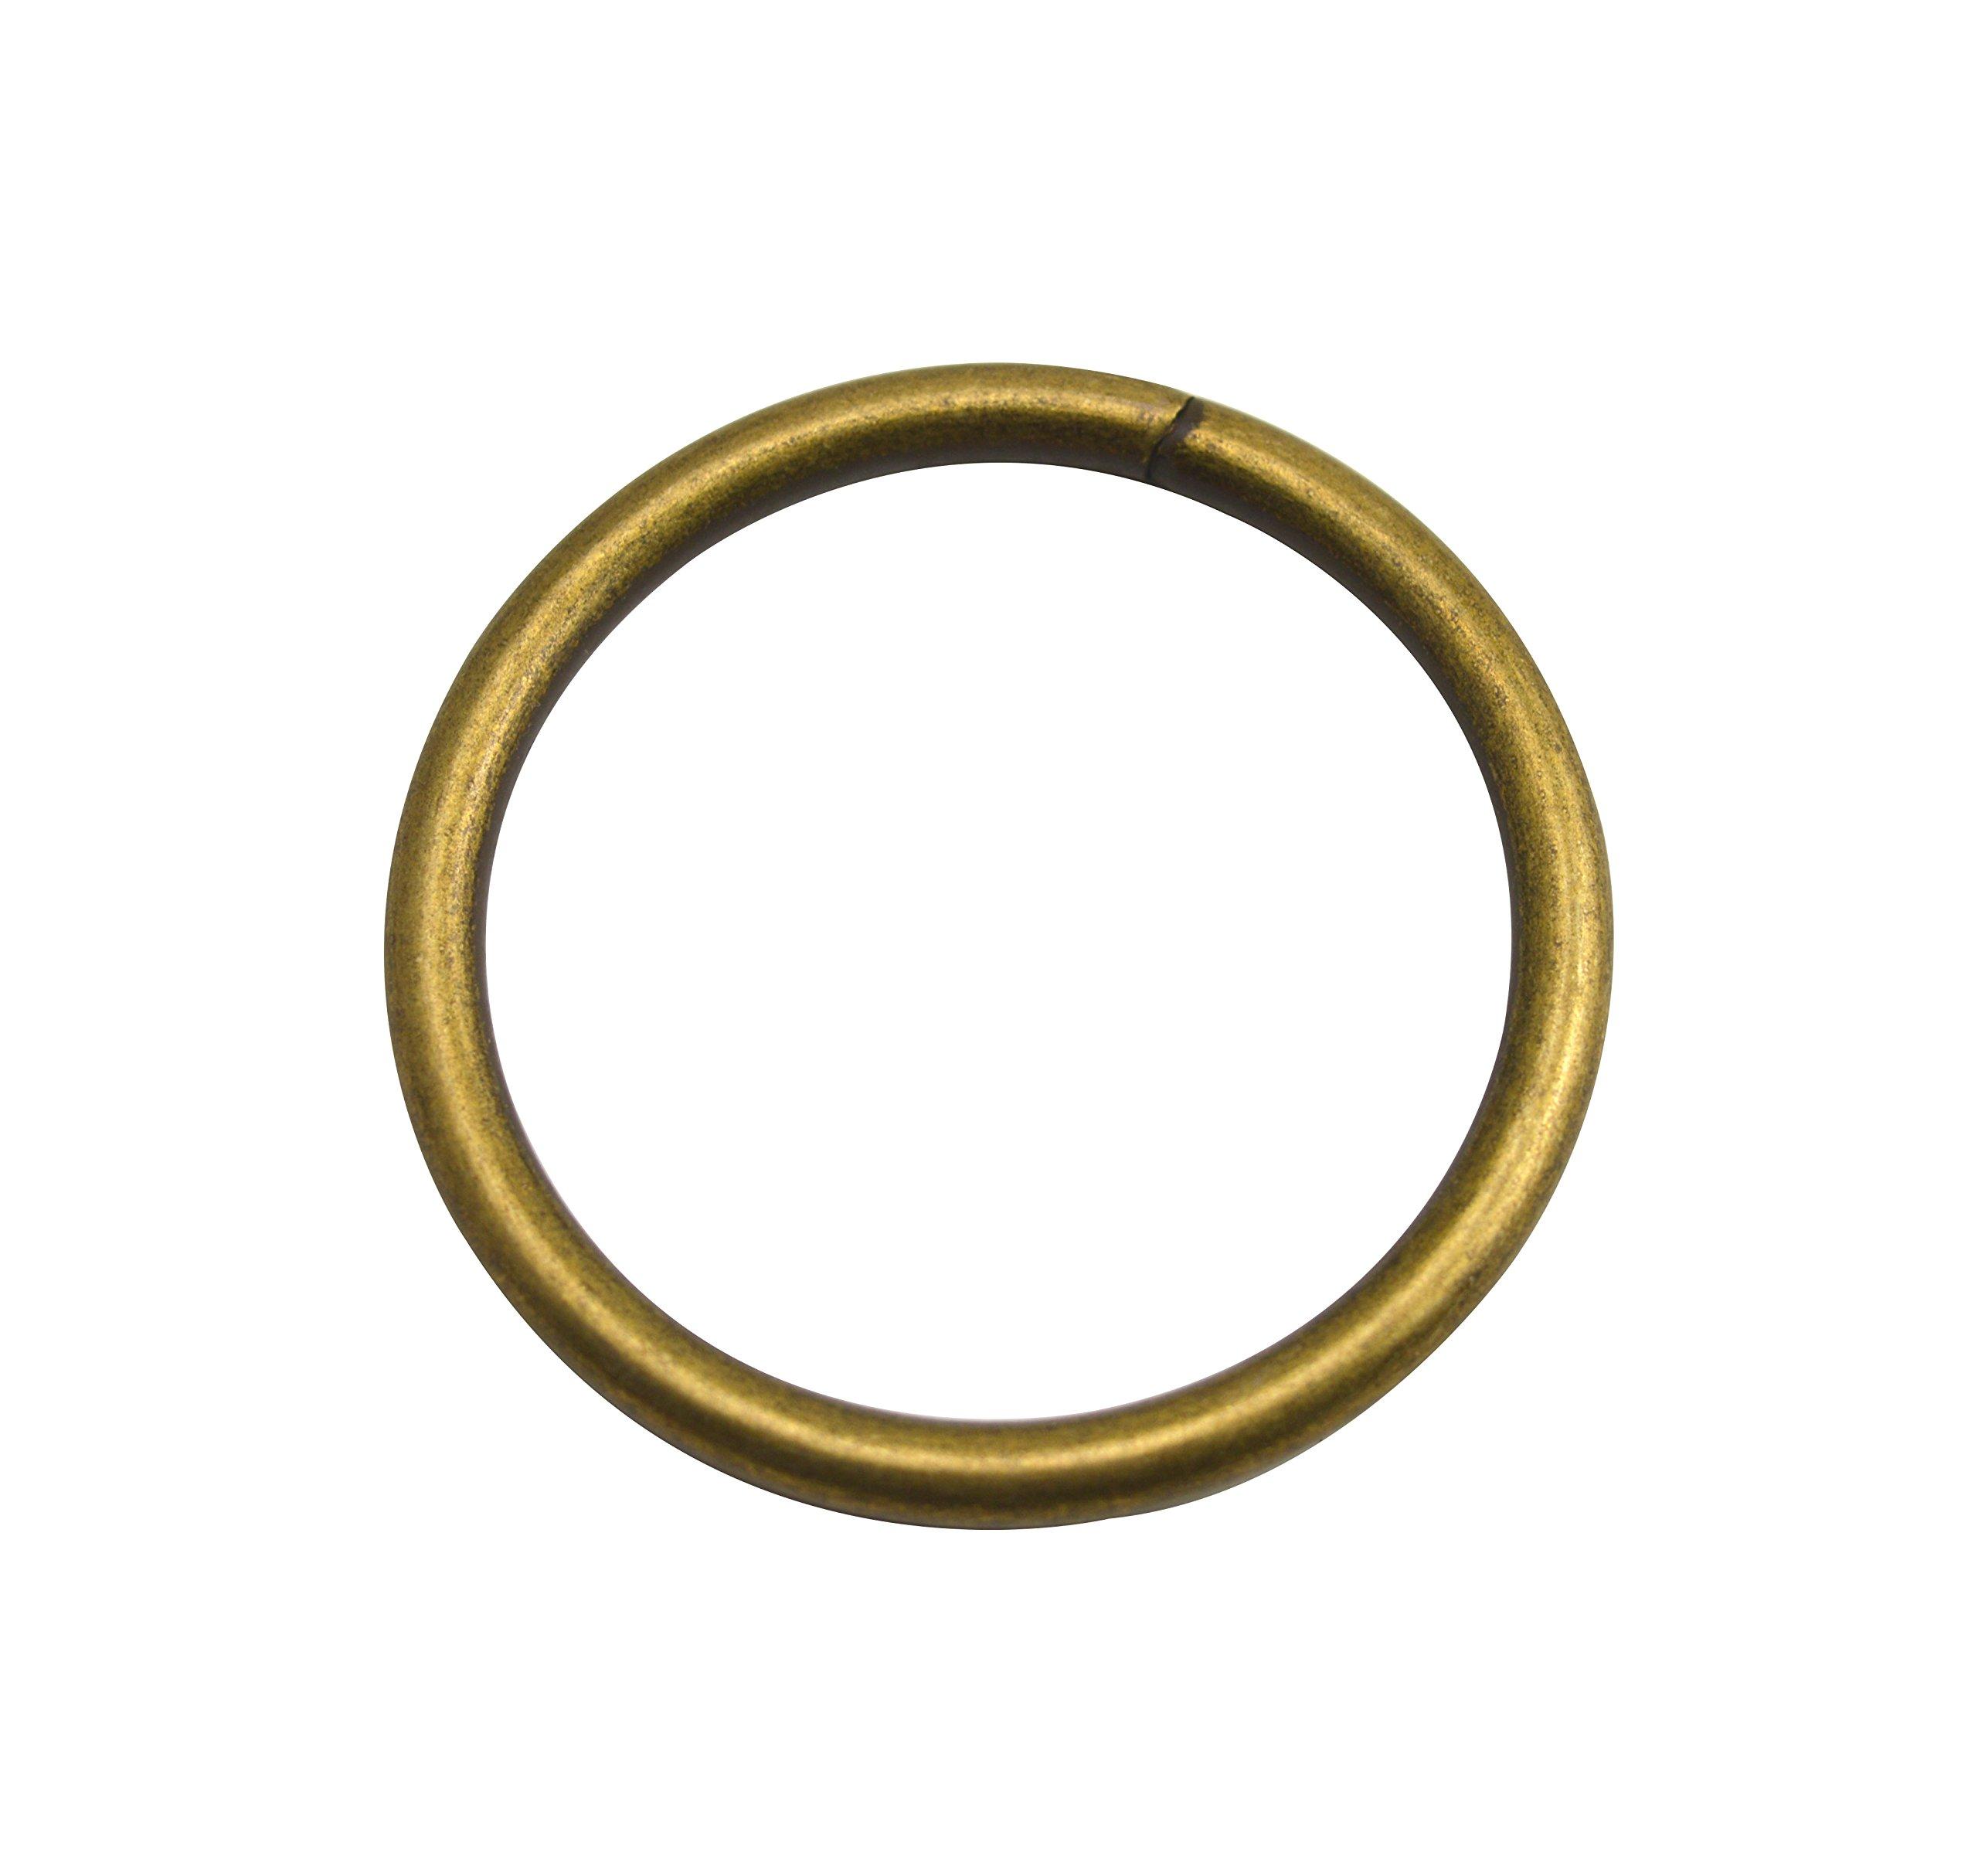 Wuuycoky Bronze 2.5'' Inner Diameter O-Rings Rings Non Welded Strap Adjuster Webbing Belts Buckle Pack of 10